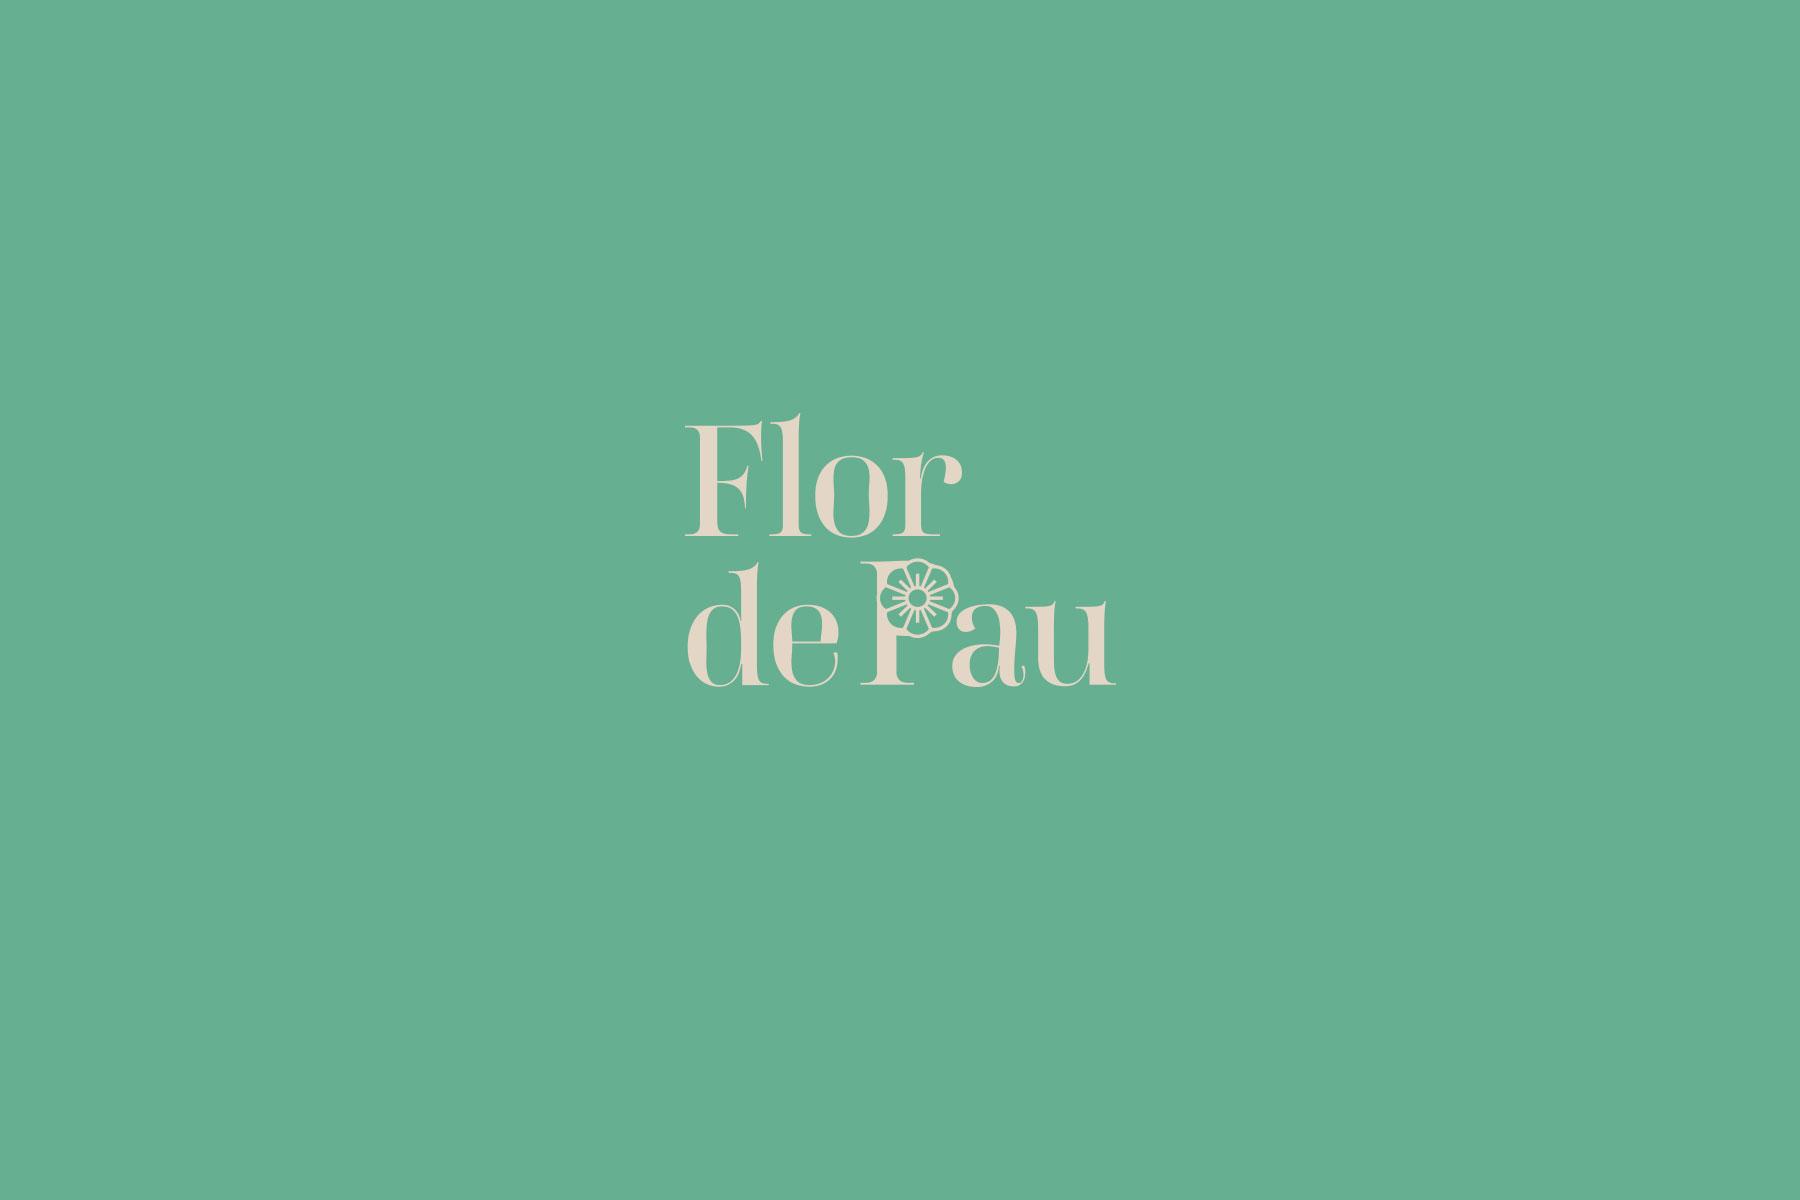 Flor-de-Pau-Disseny-Grafic-Marca-01